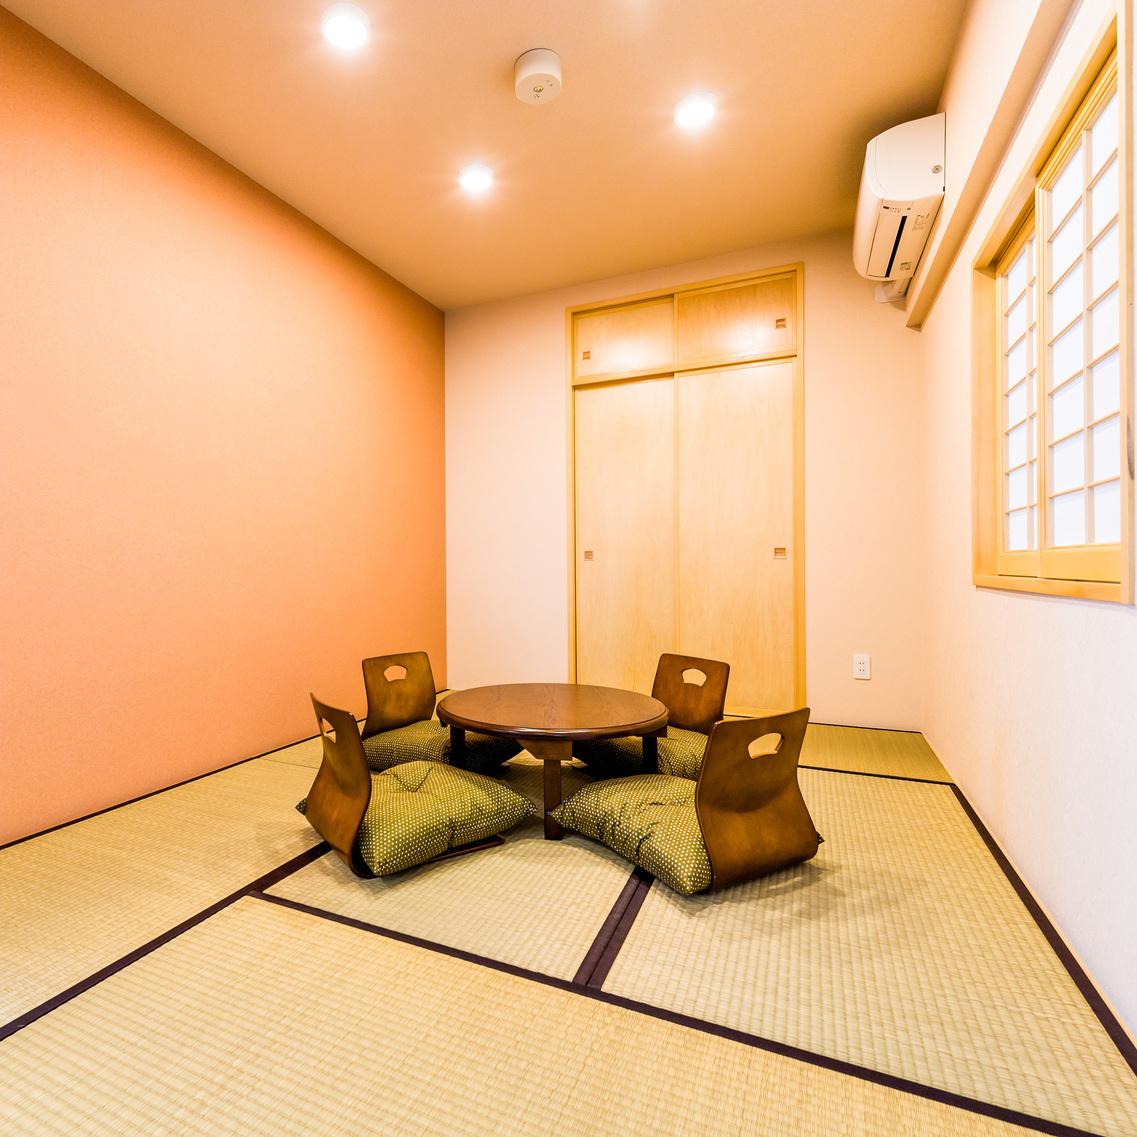 MINATO Chatan Seaside Condominium / 【スタンダード】コンドミニアムで過ごす極上の休日 《素泊り》 #4